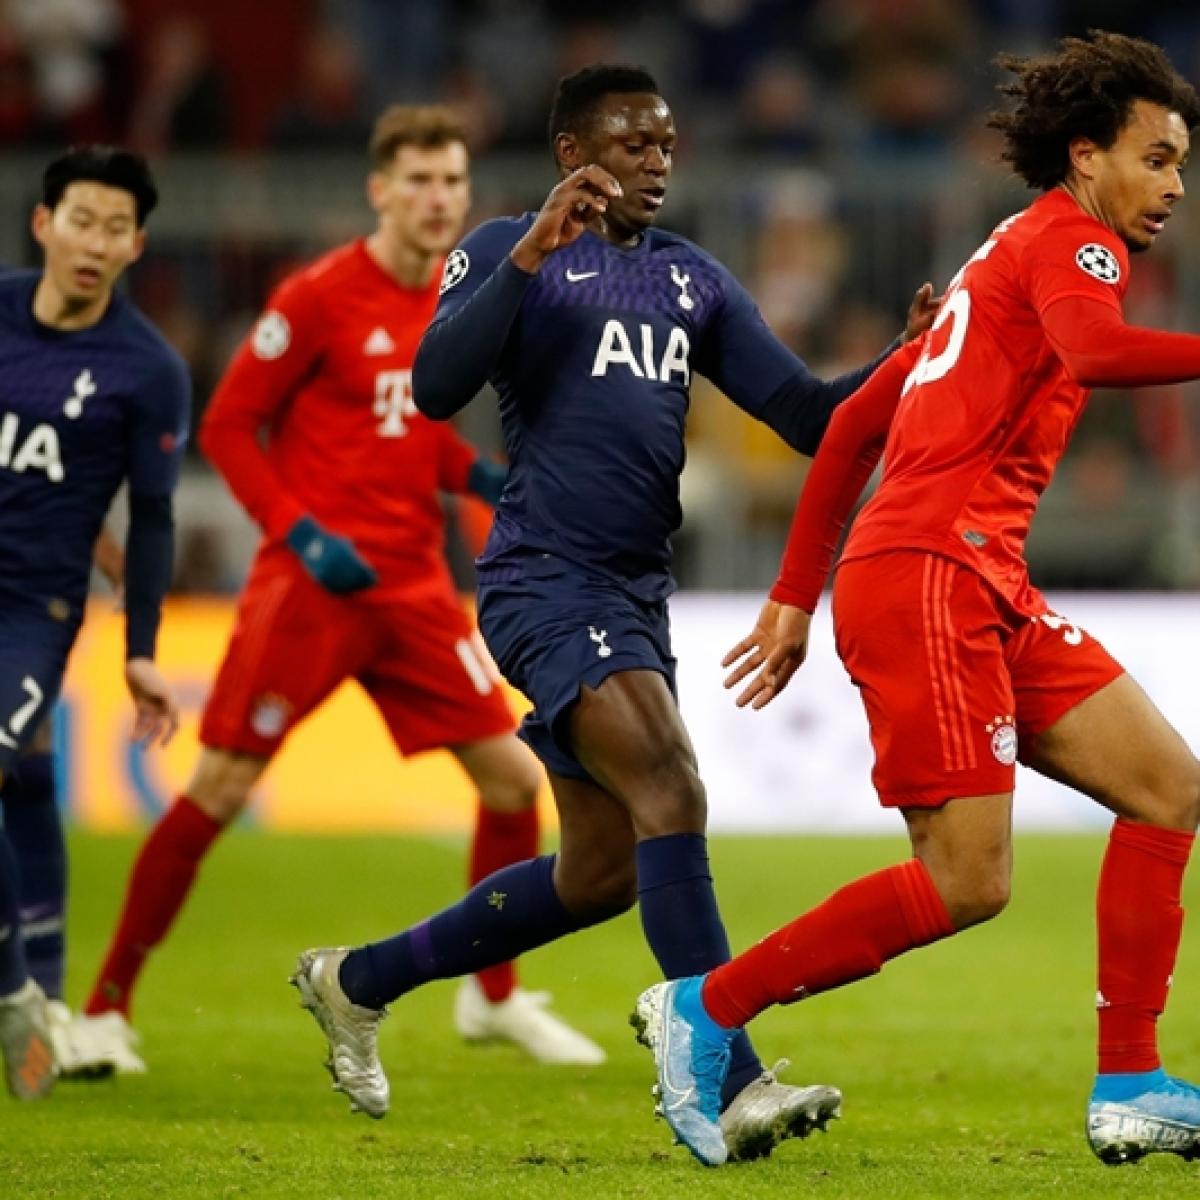 Champions League: Bayern Munich continue winning streak, defeat Tottenham